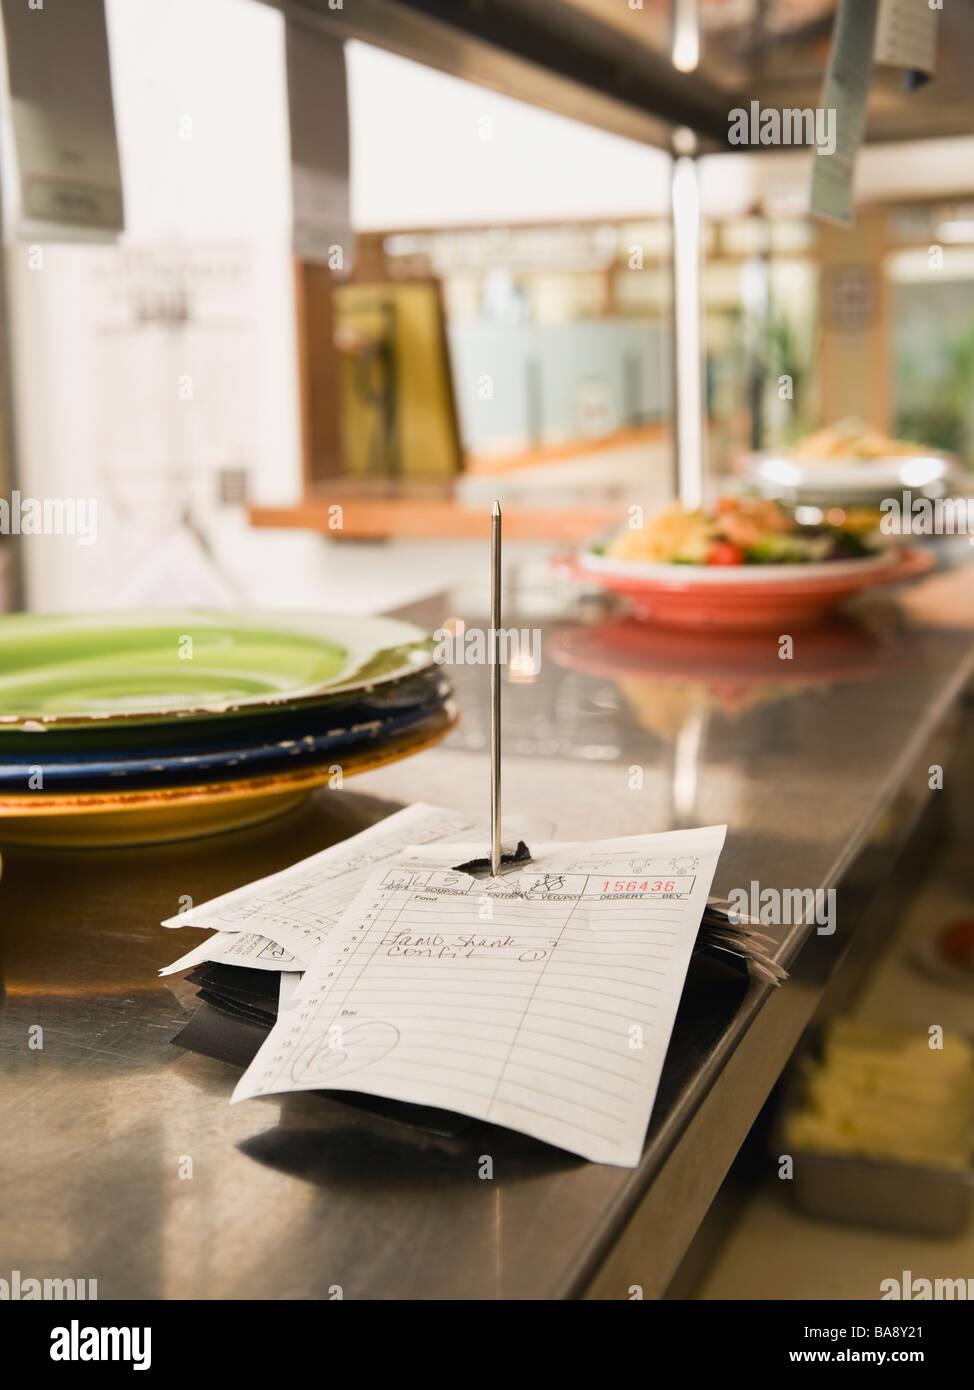 Food order spike in restaurant kitchen Stock Photo